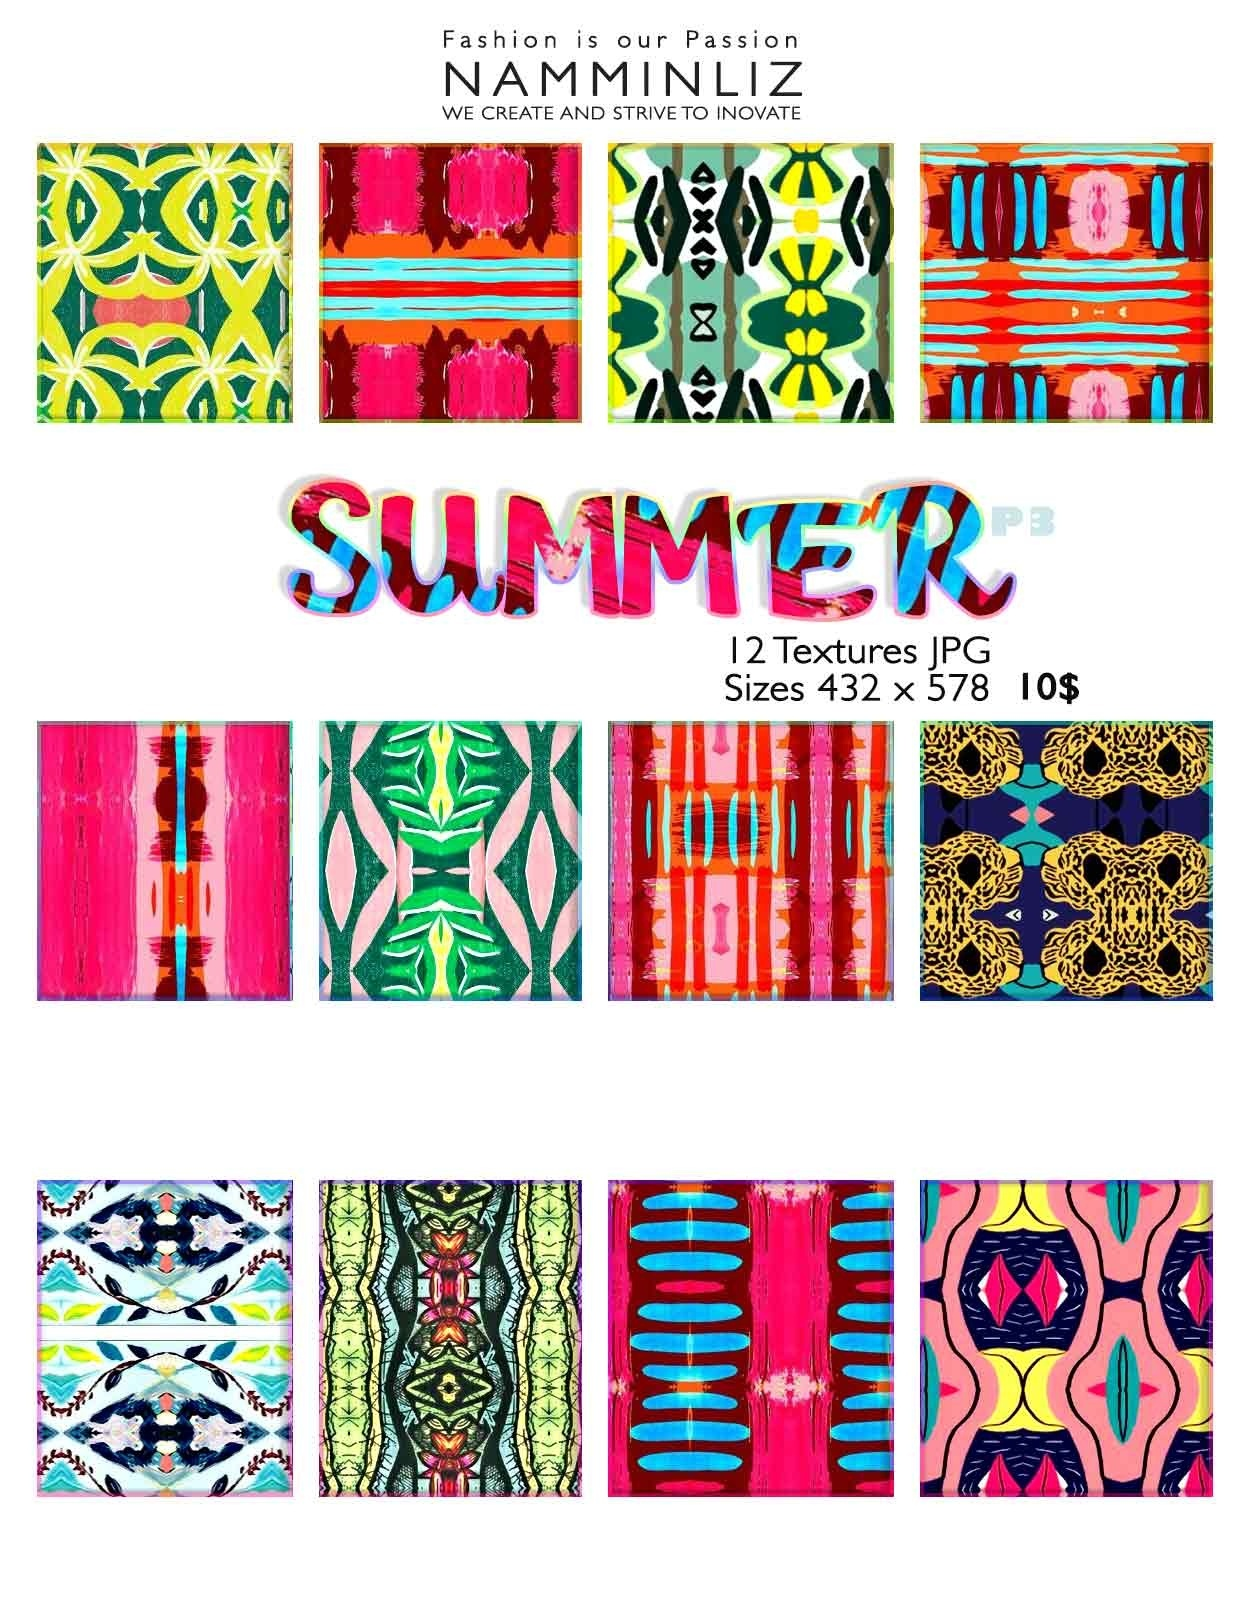 Summer Textures P3  • 12 Textures JPG imvu NAMMINLIZ